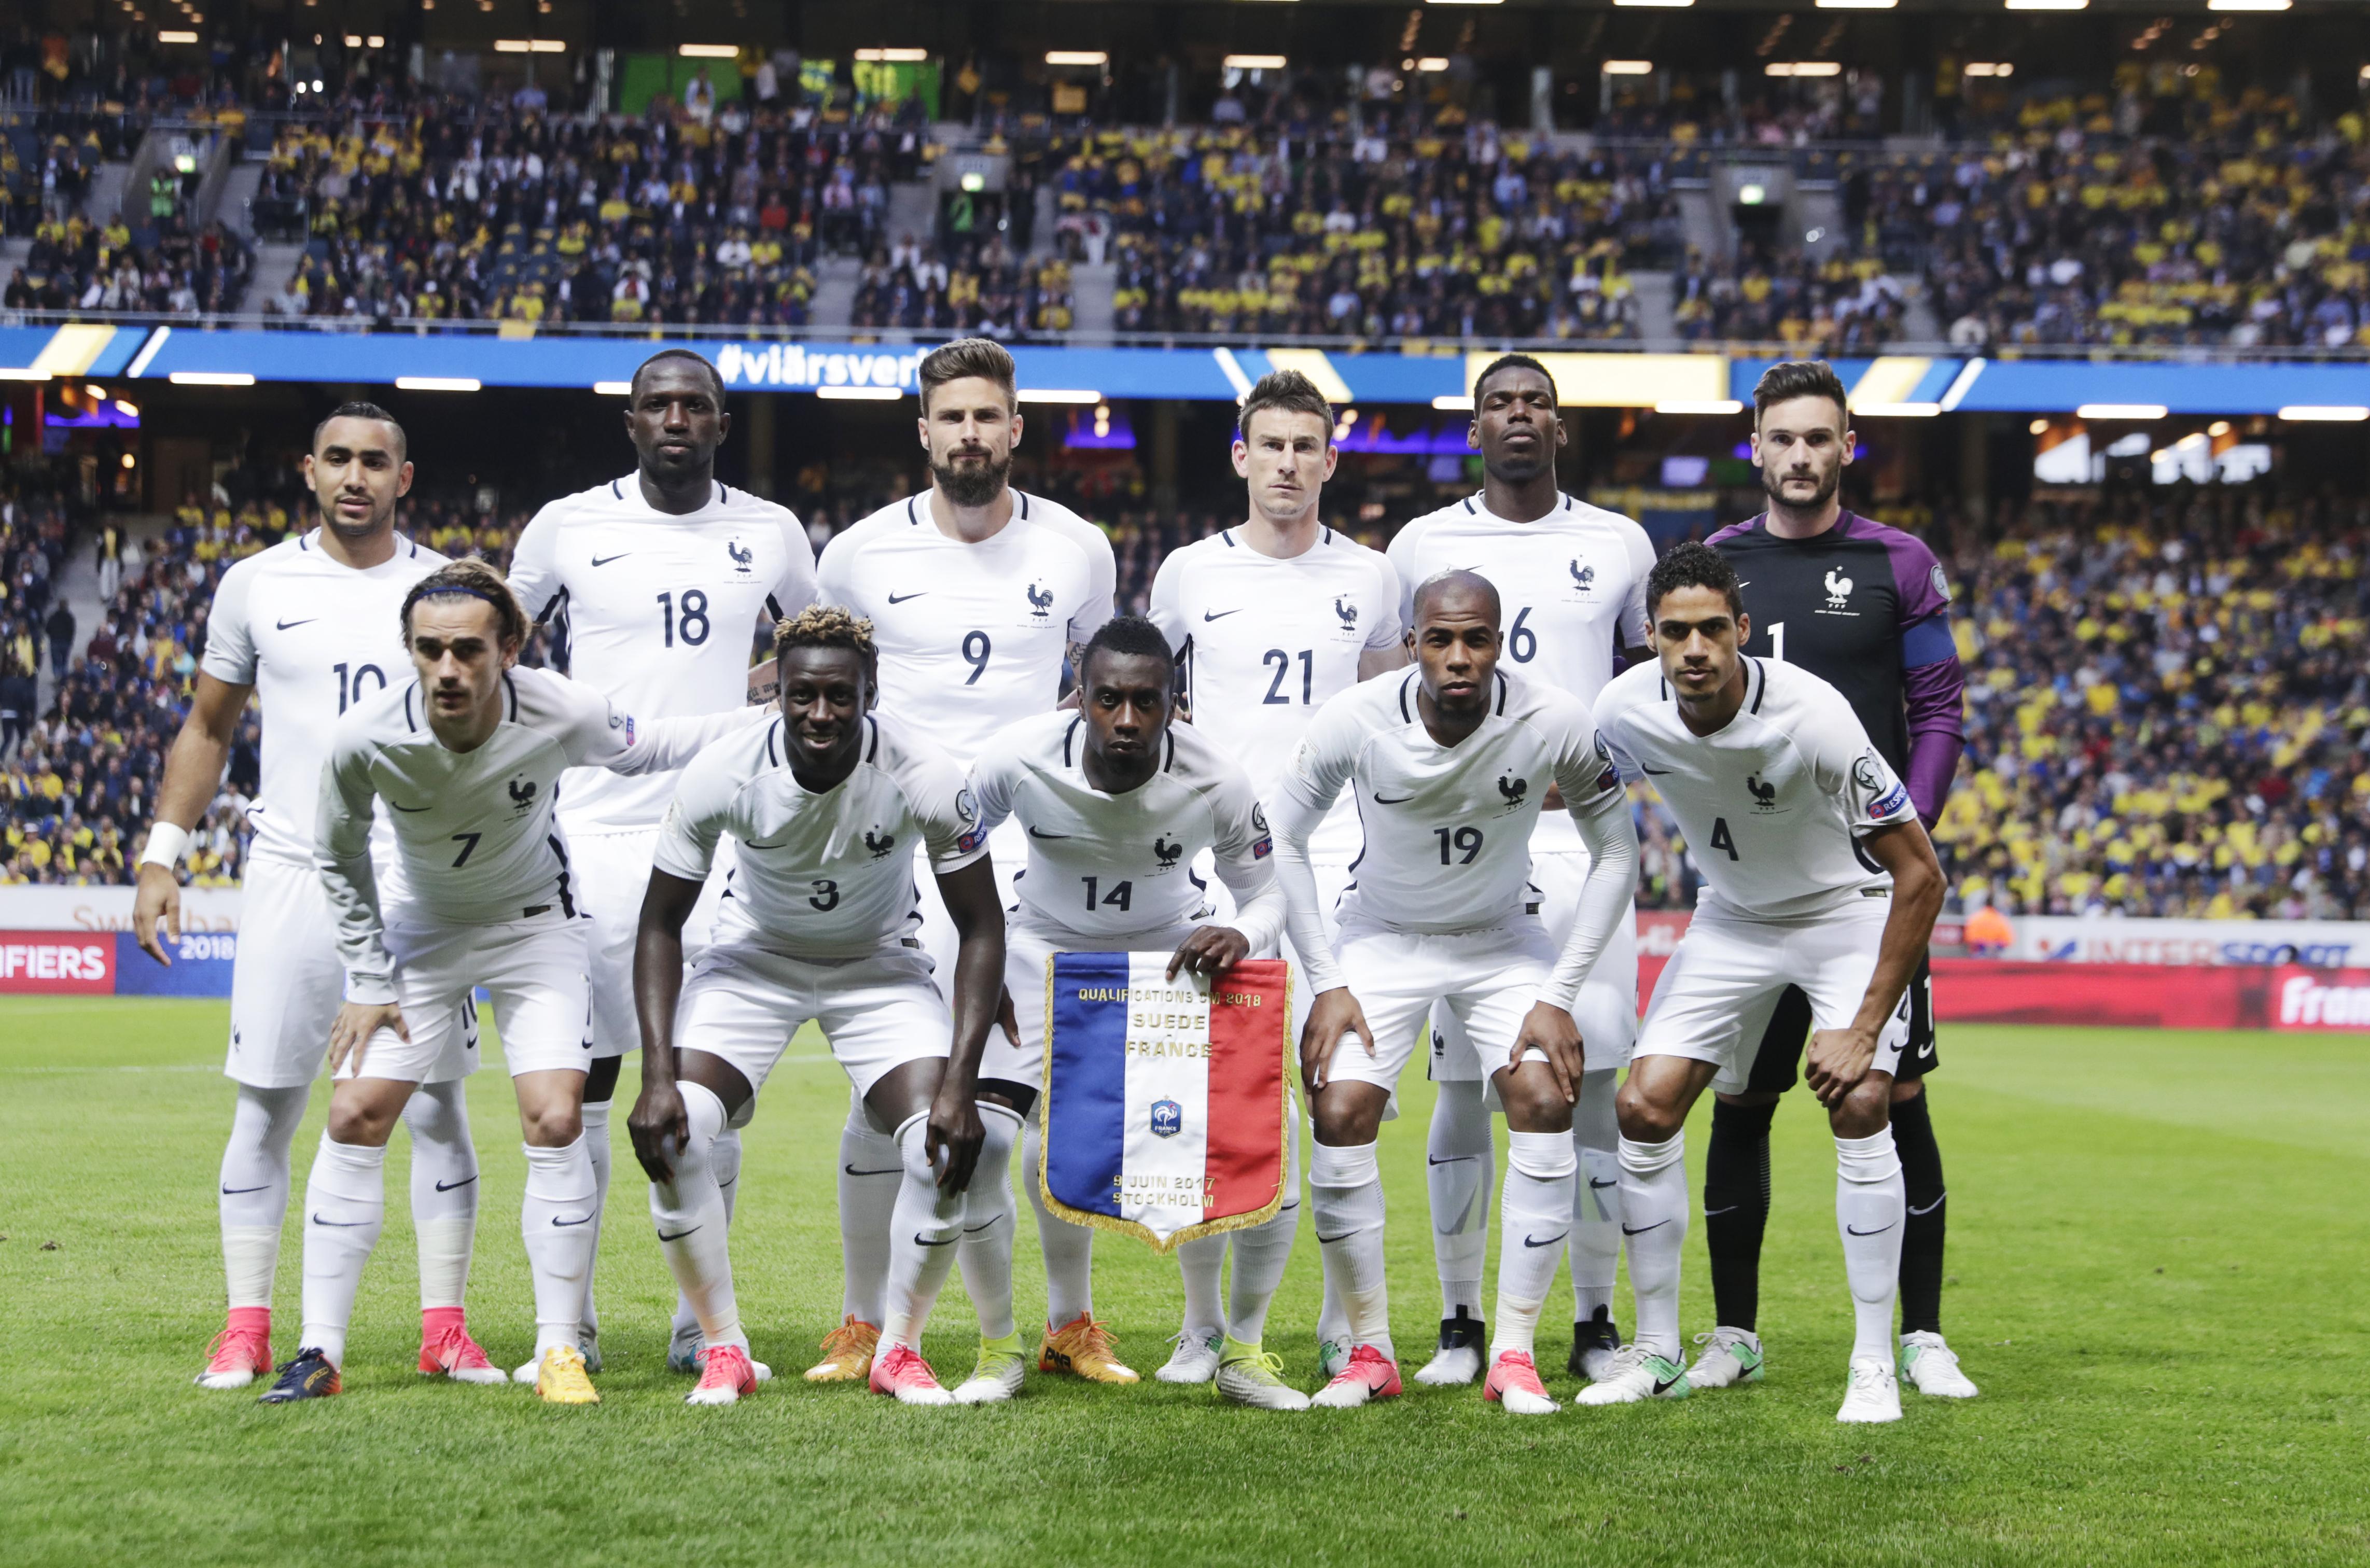 аргентина ставки матча германия